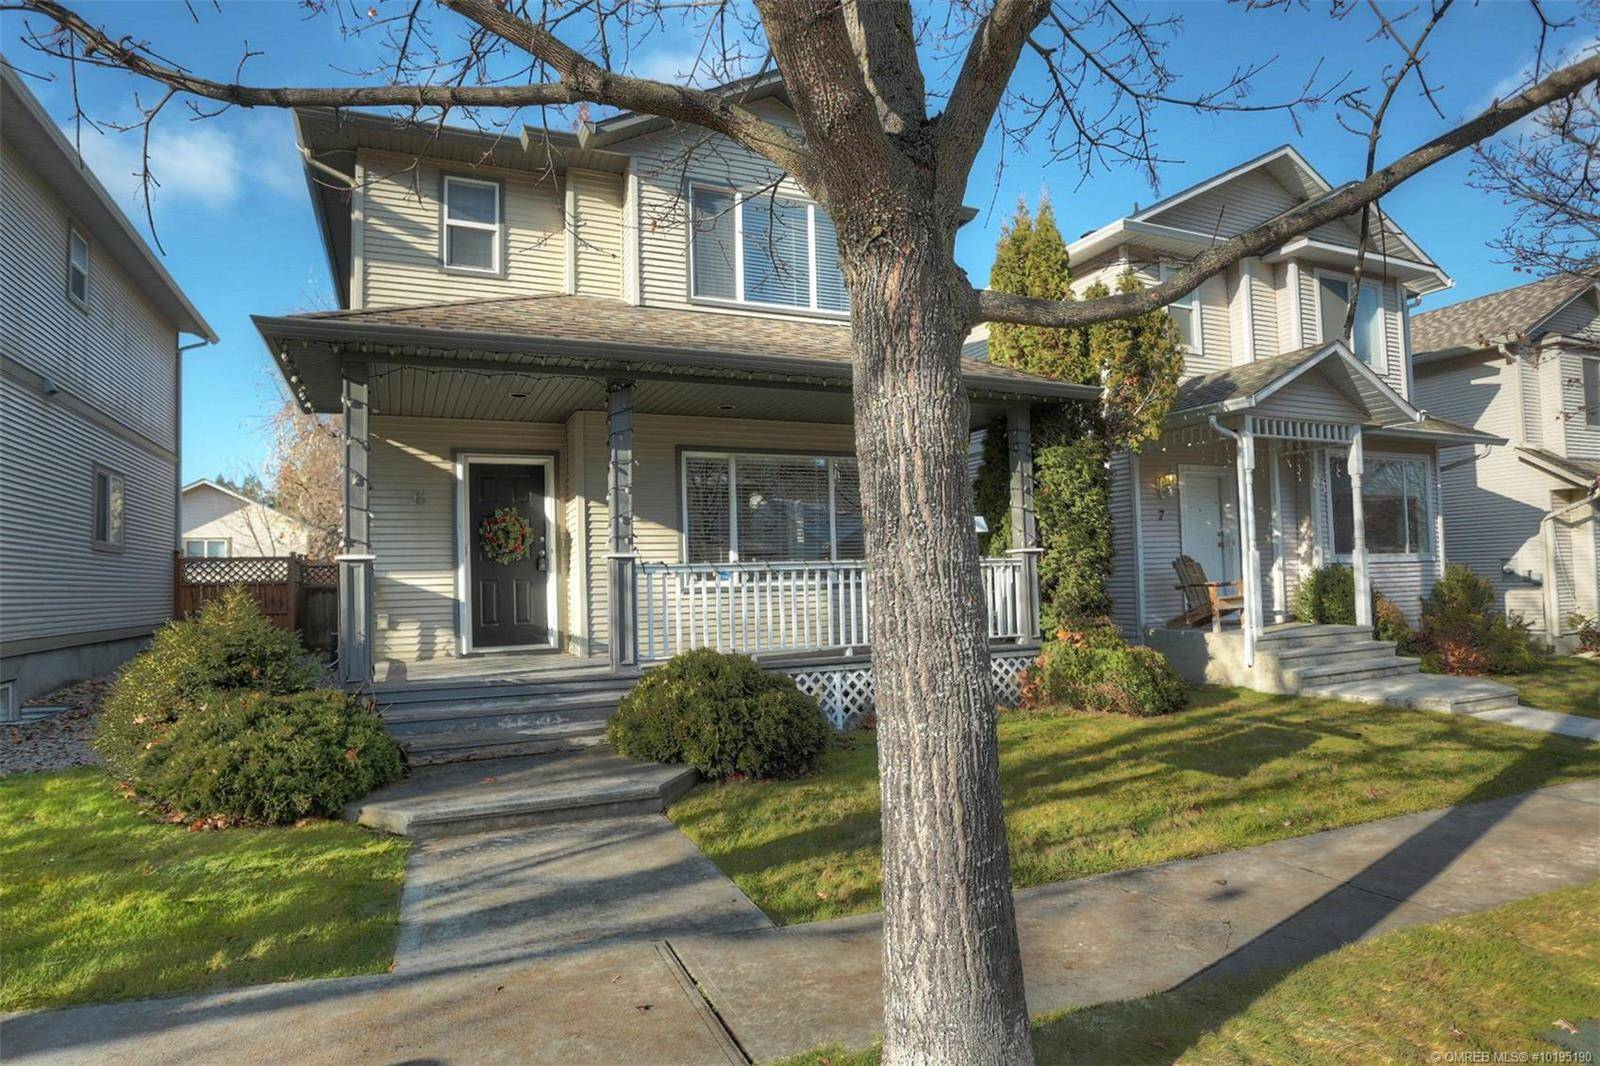 House for sale at 2210 Horizon Dr Unit 6 Kelowna British Columbia - MLS: 10195190